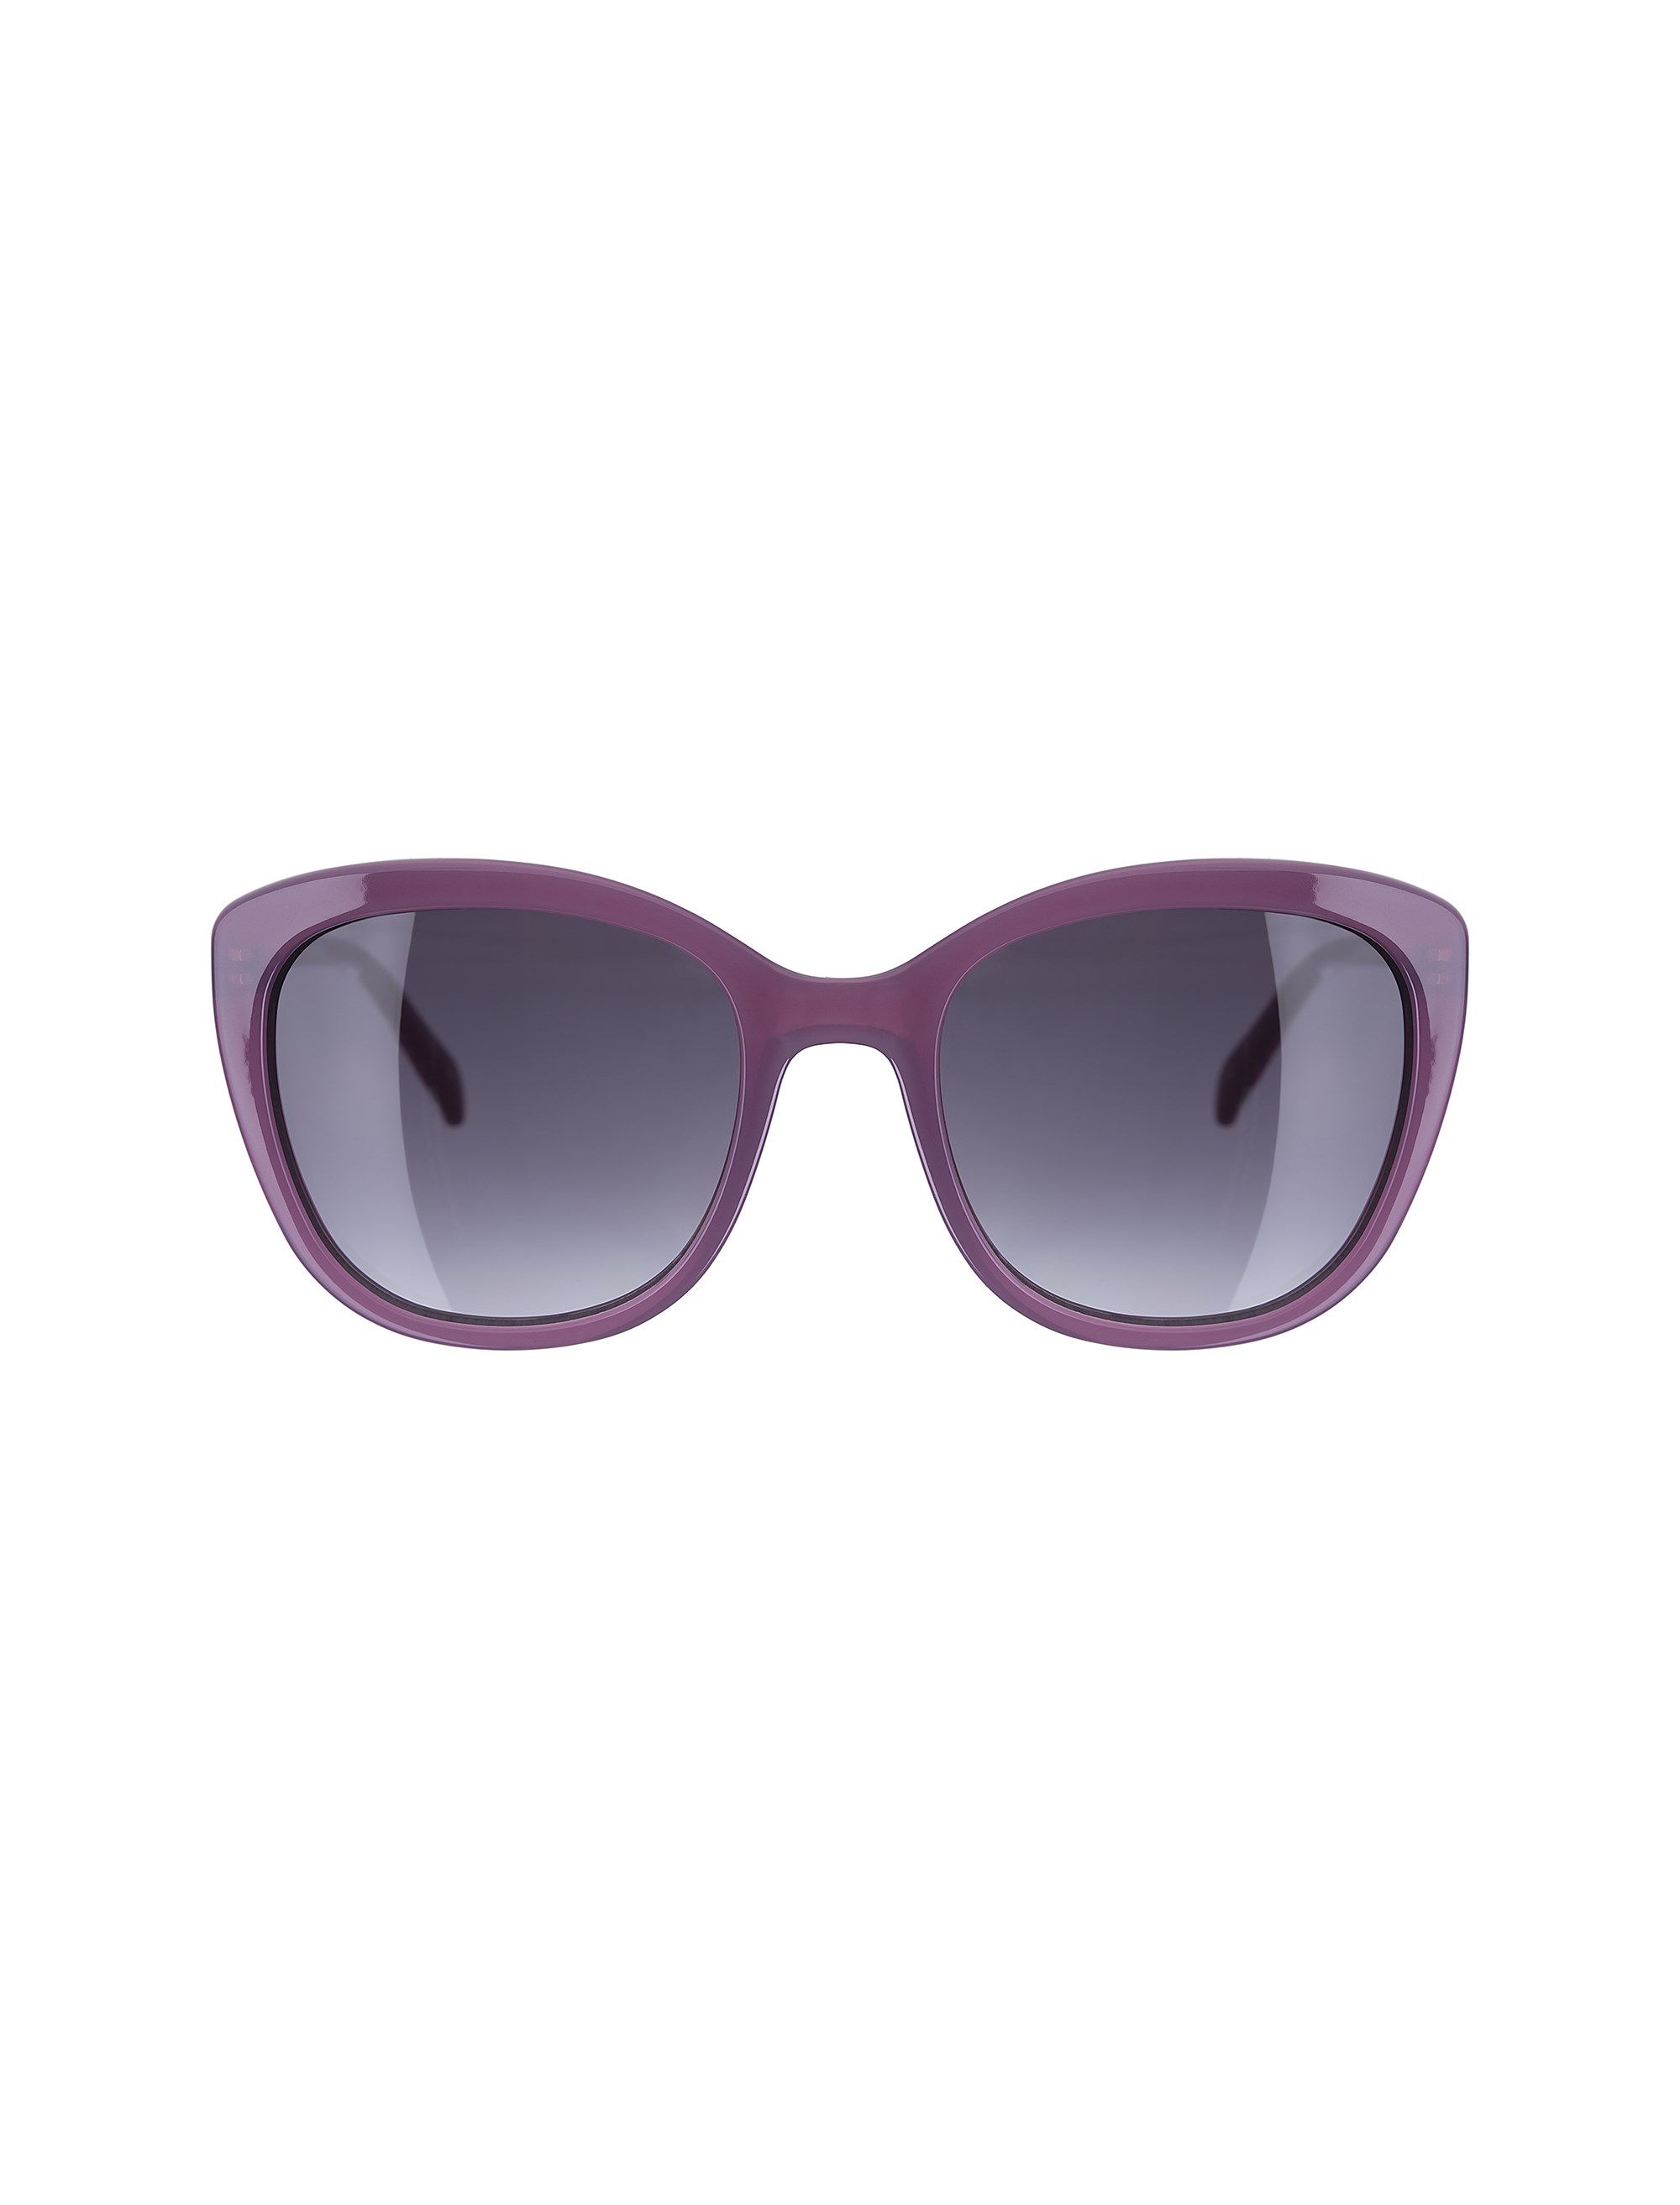 قیمت عینک آفتابی ویفرر زنانه - کت کیتسون